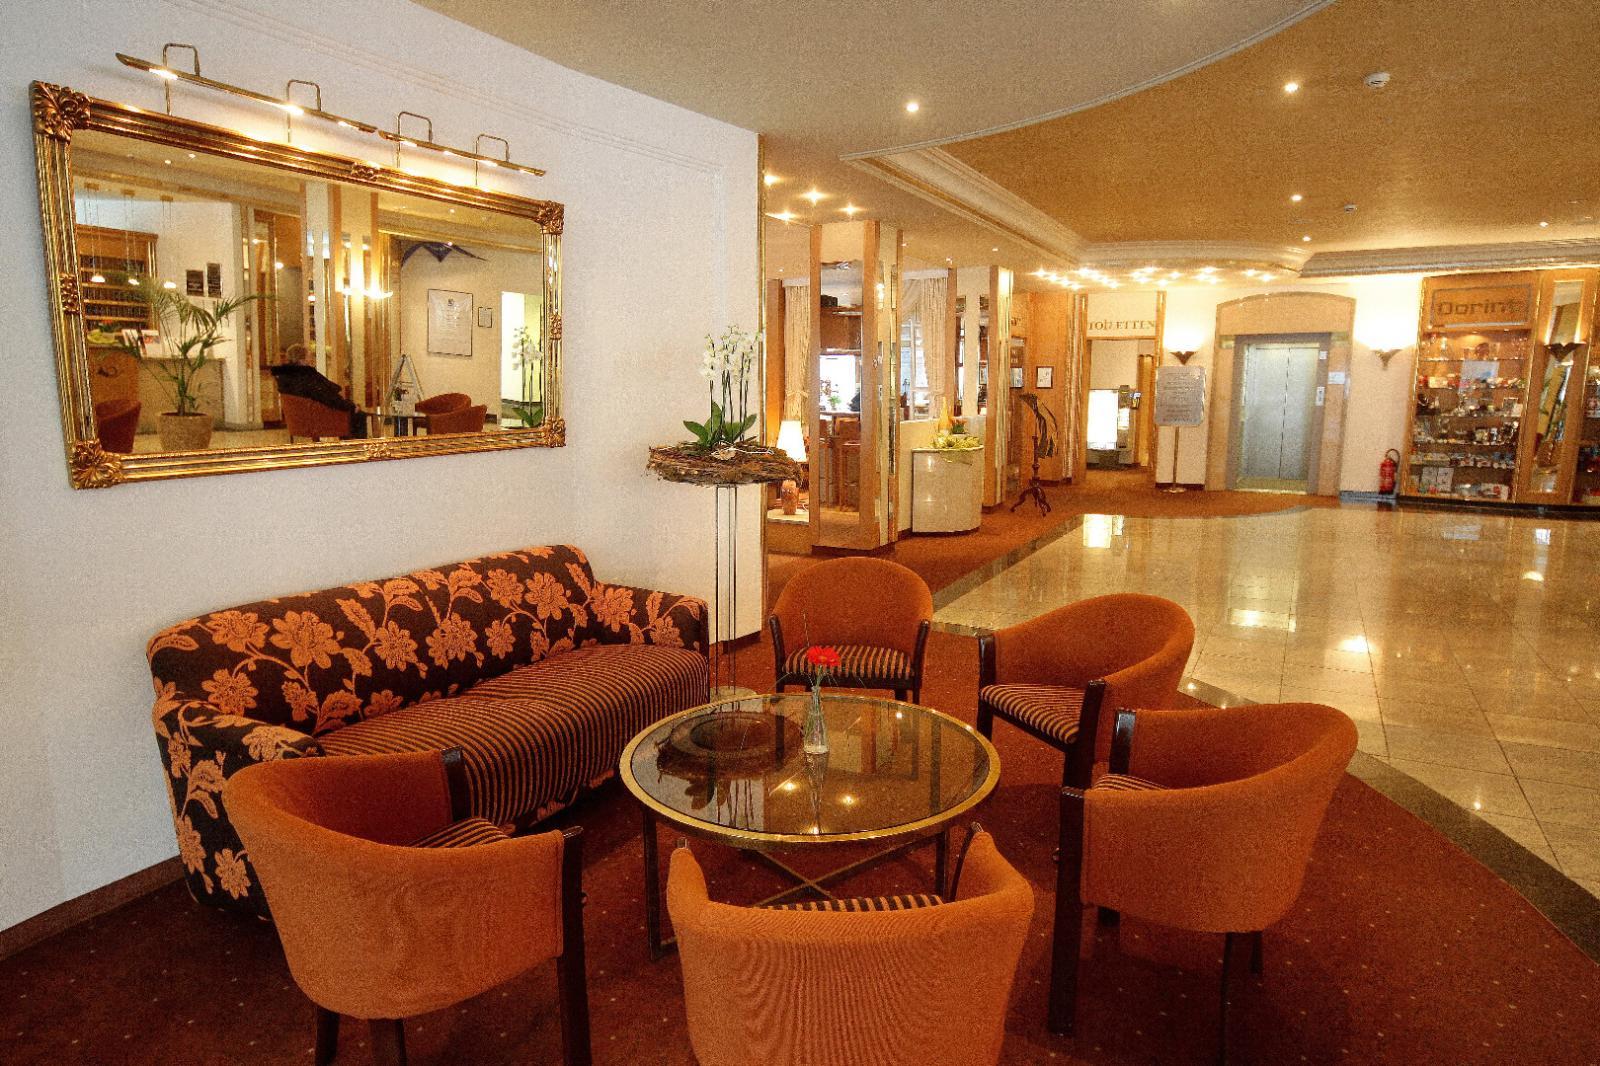 Dorint Hotel Bitburg Bewertung